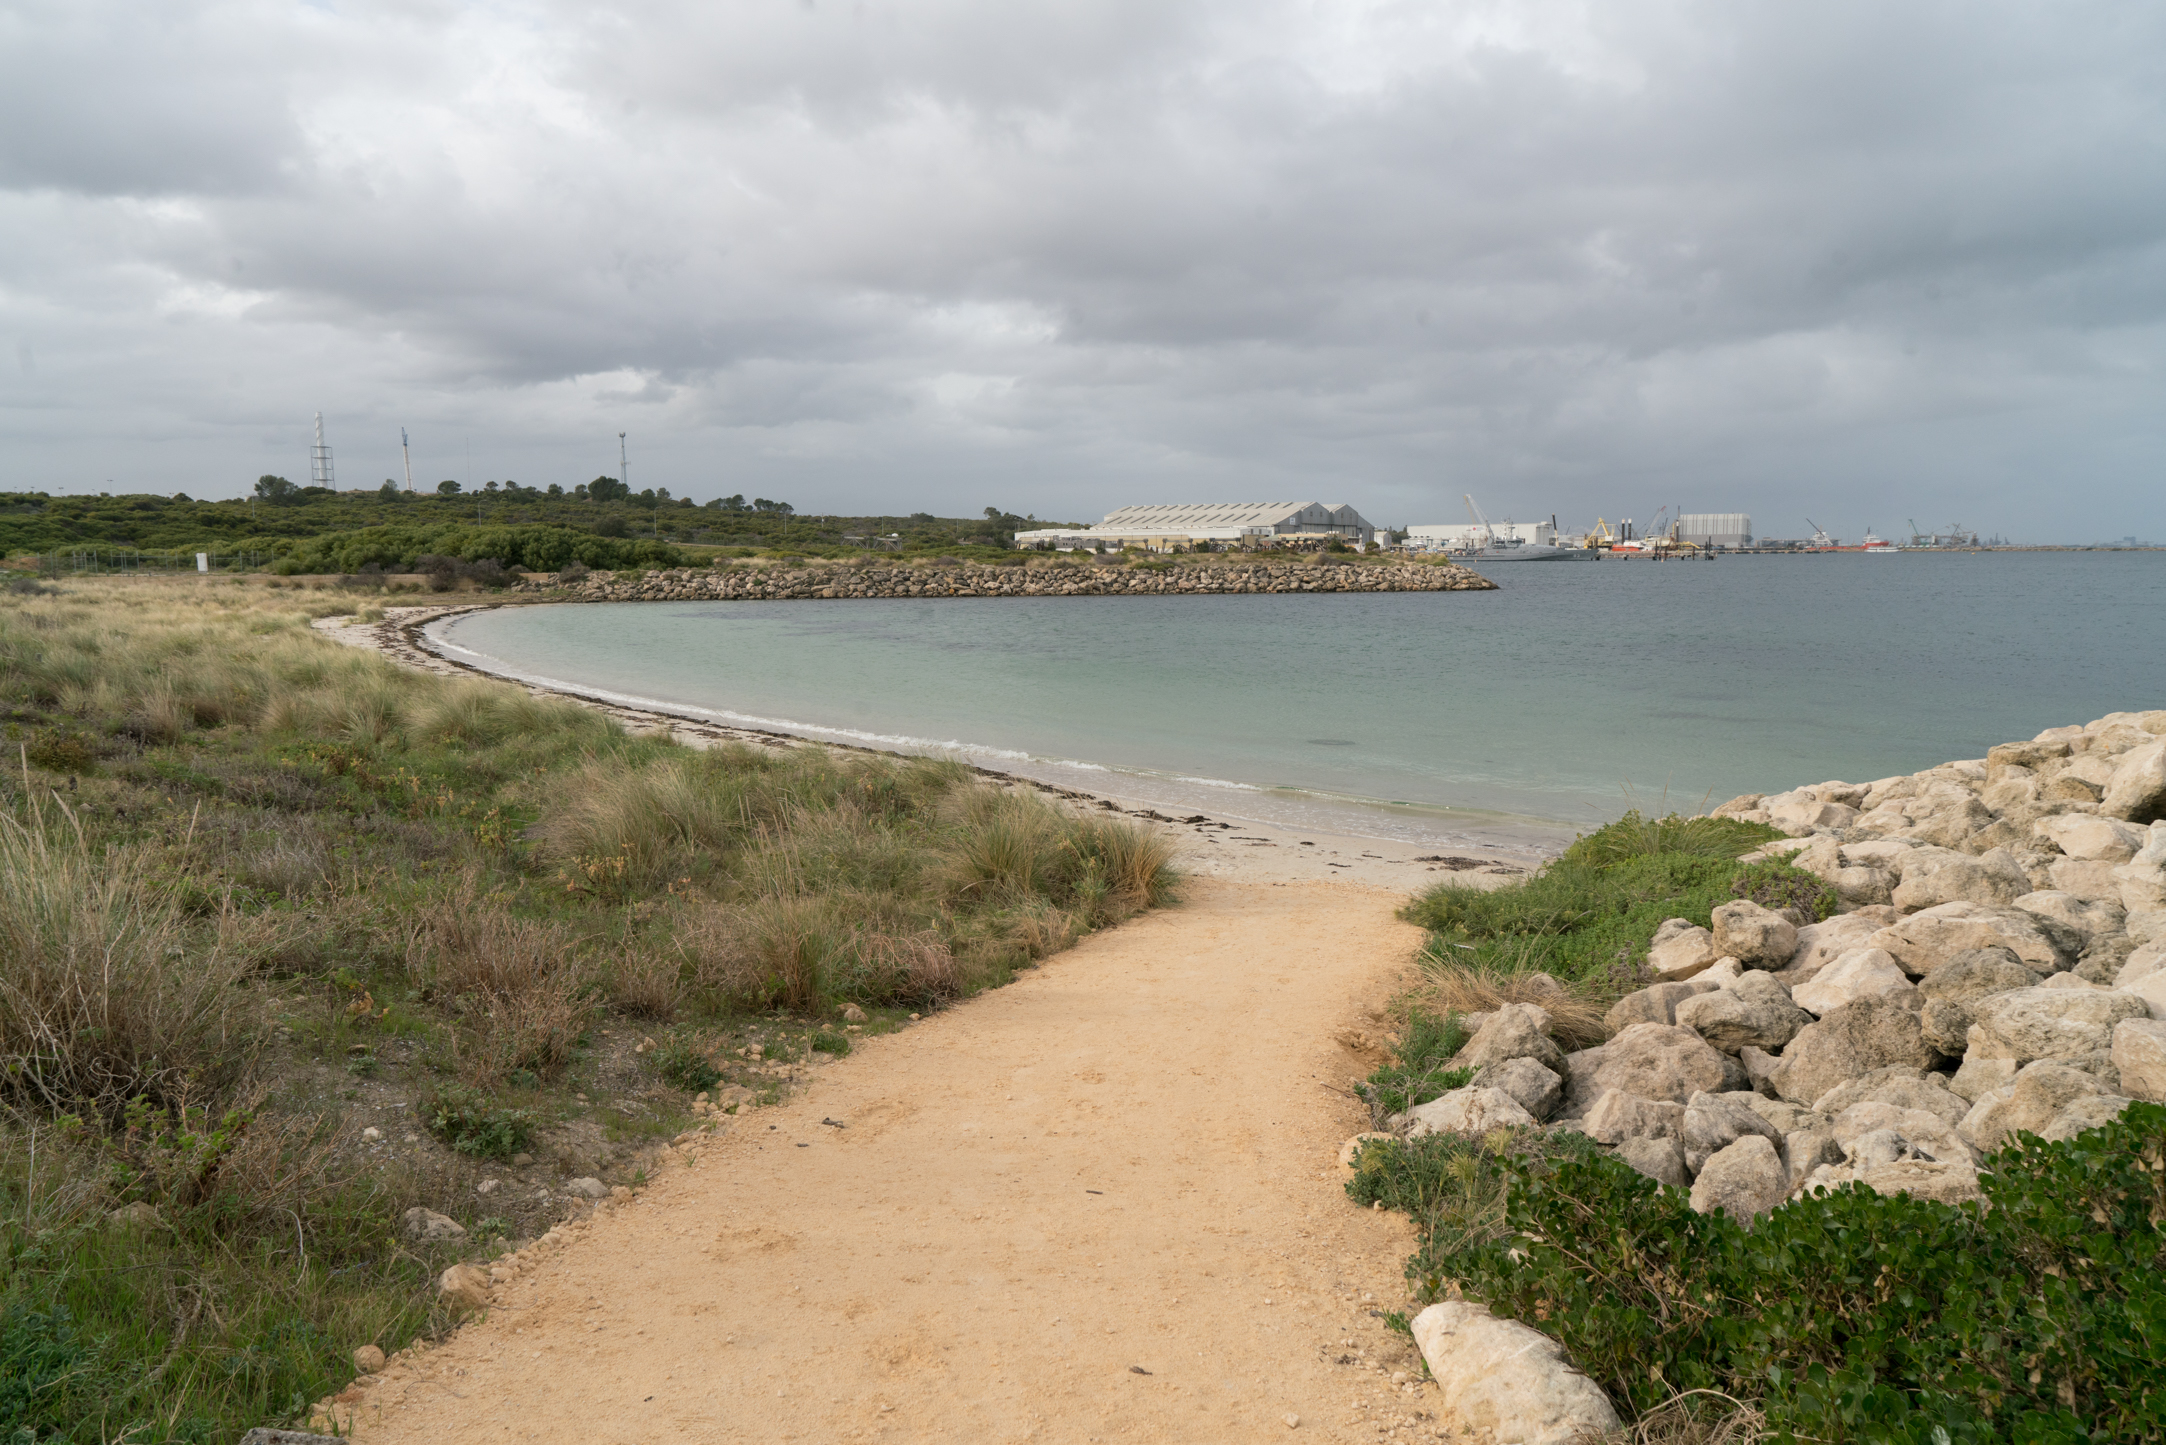 Plate 15: Beach walk and Rock Groyne